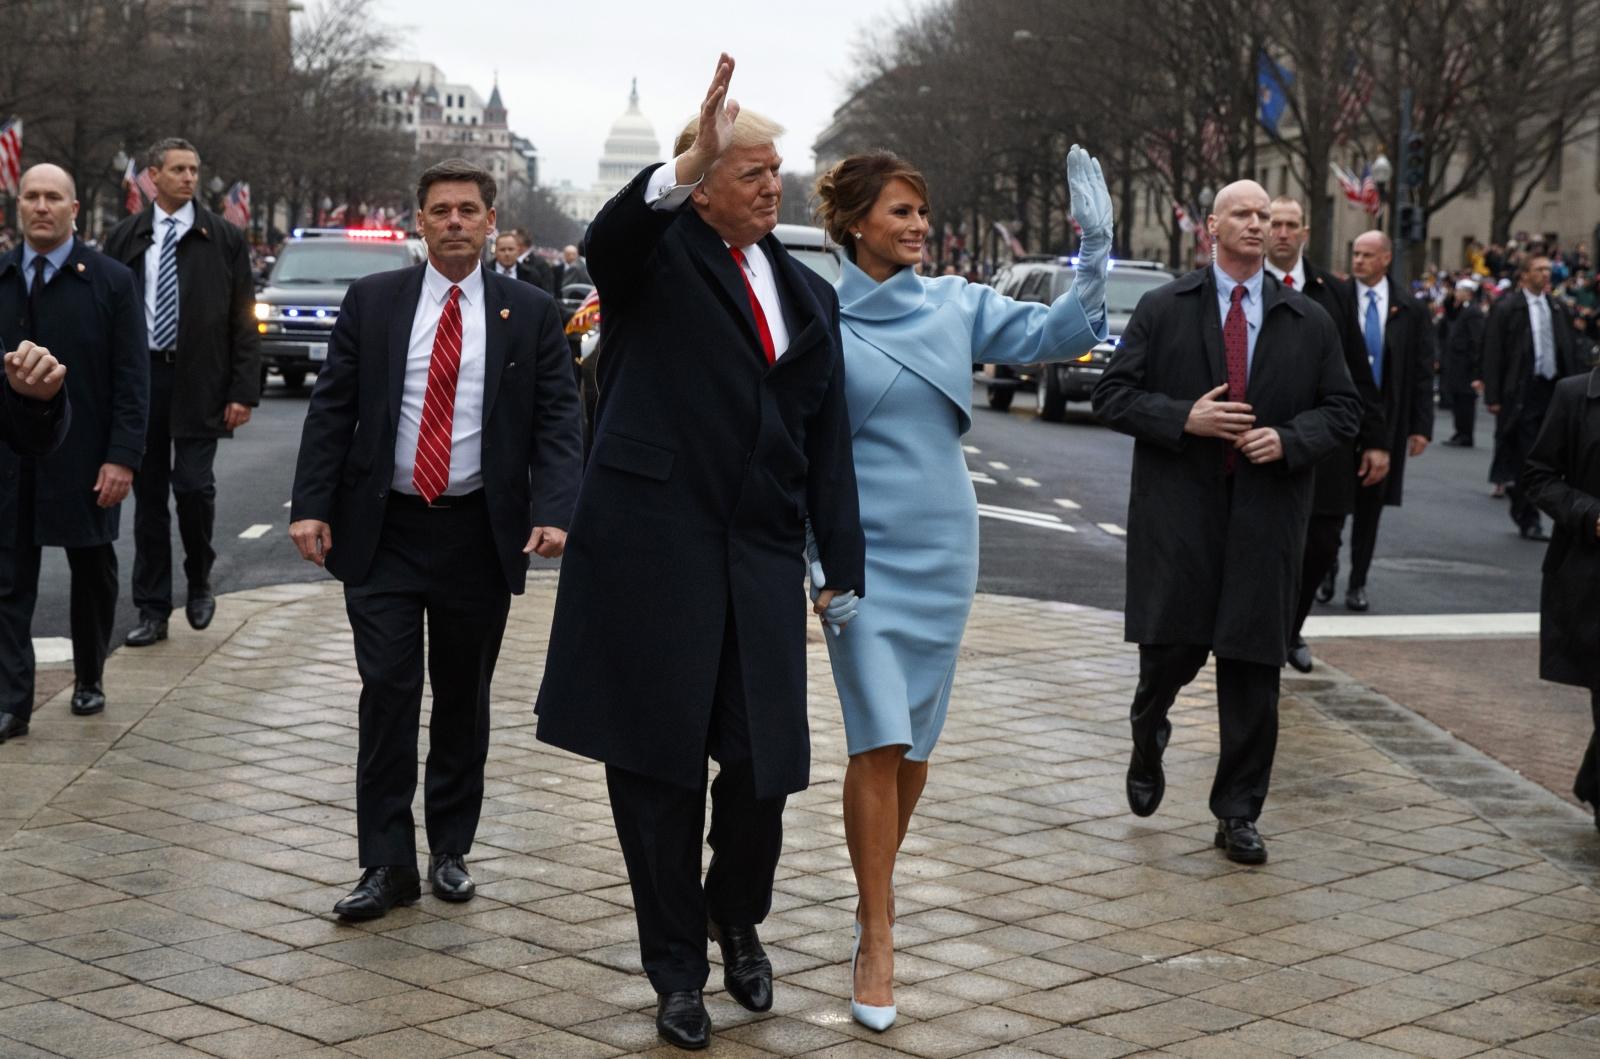 Trump bodyguard hands